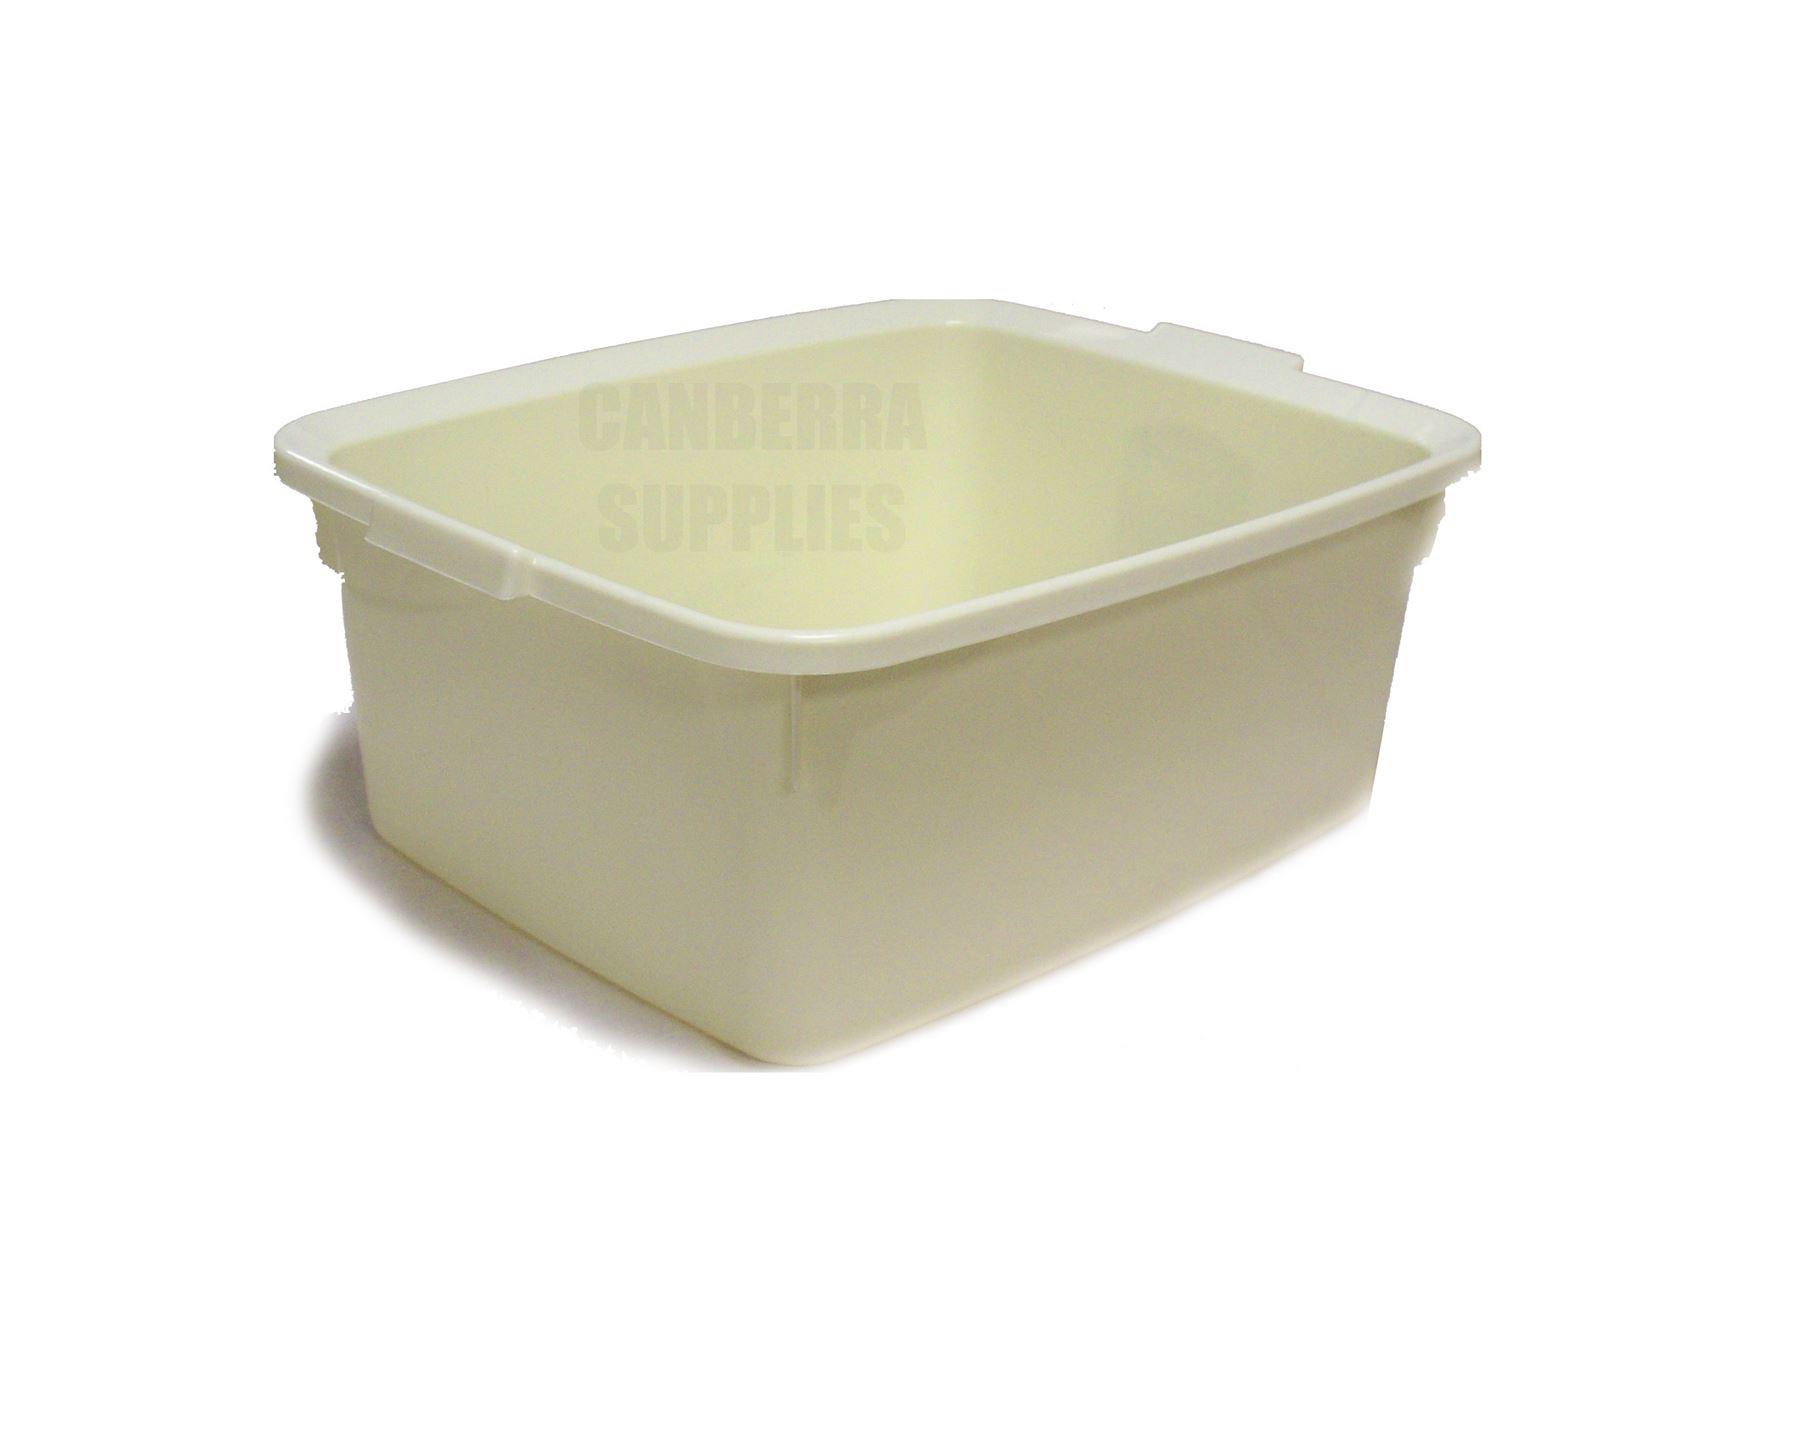 Plastic Wash Basin Sink : linen cream 42cm plastic washing up sink bowl 12l high quality bowl ...